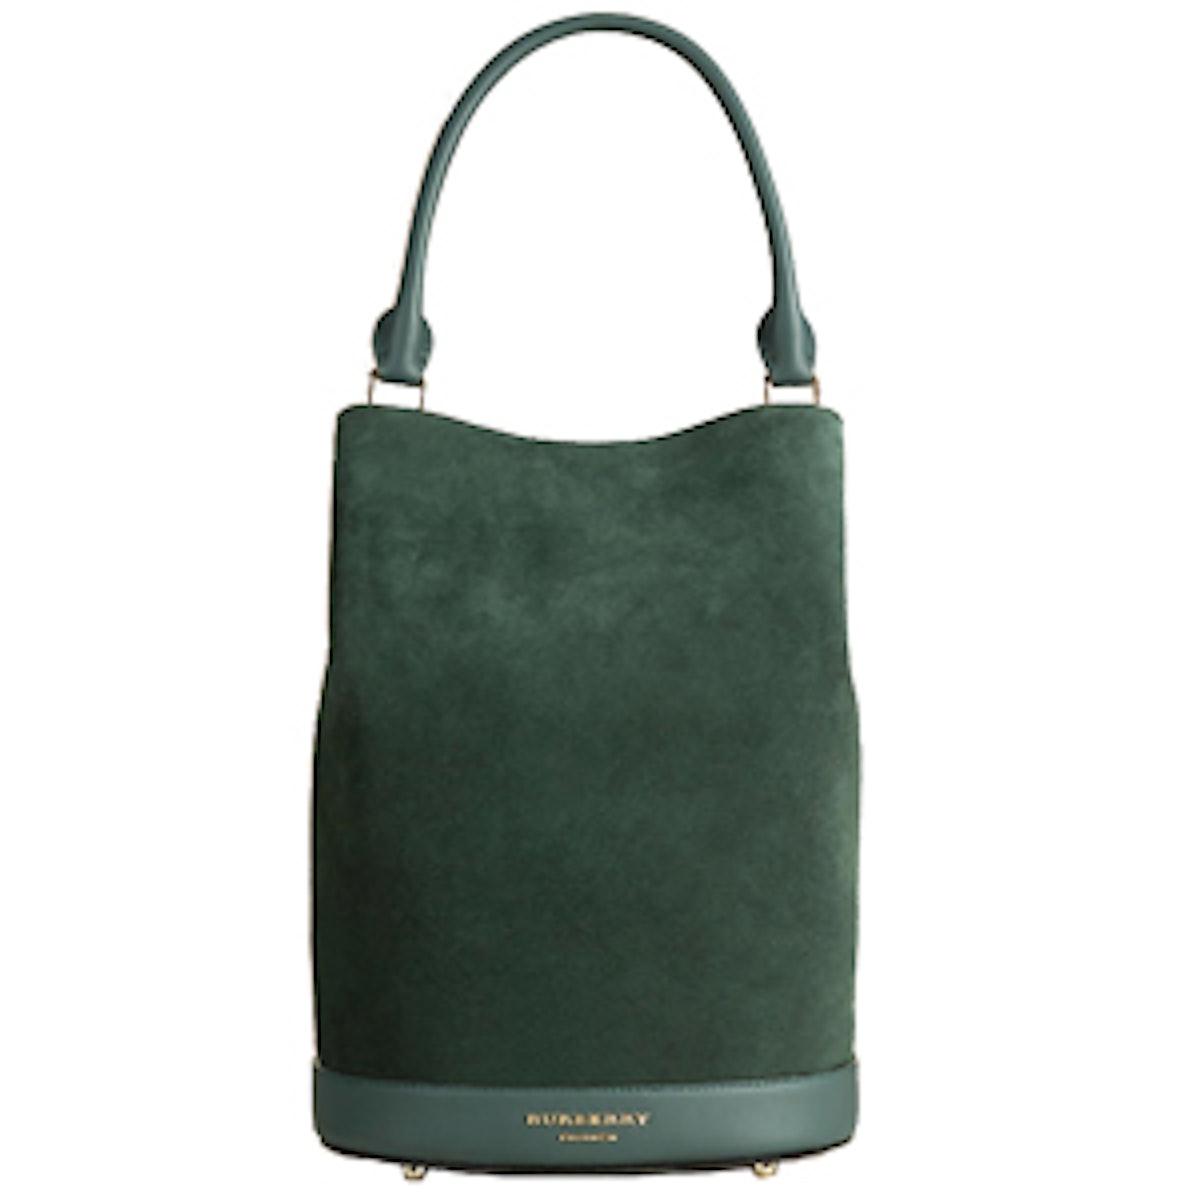 The Bucket Bag in Racing Green